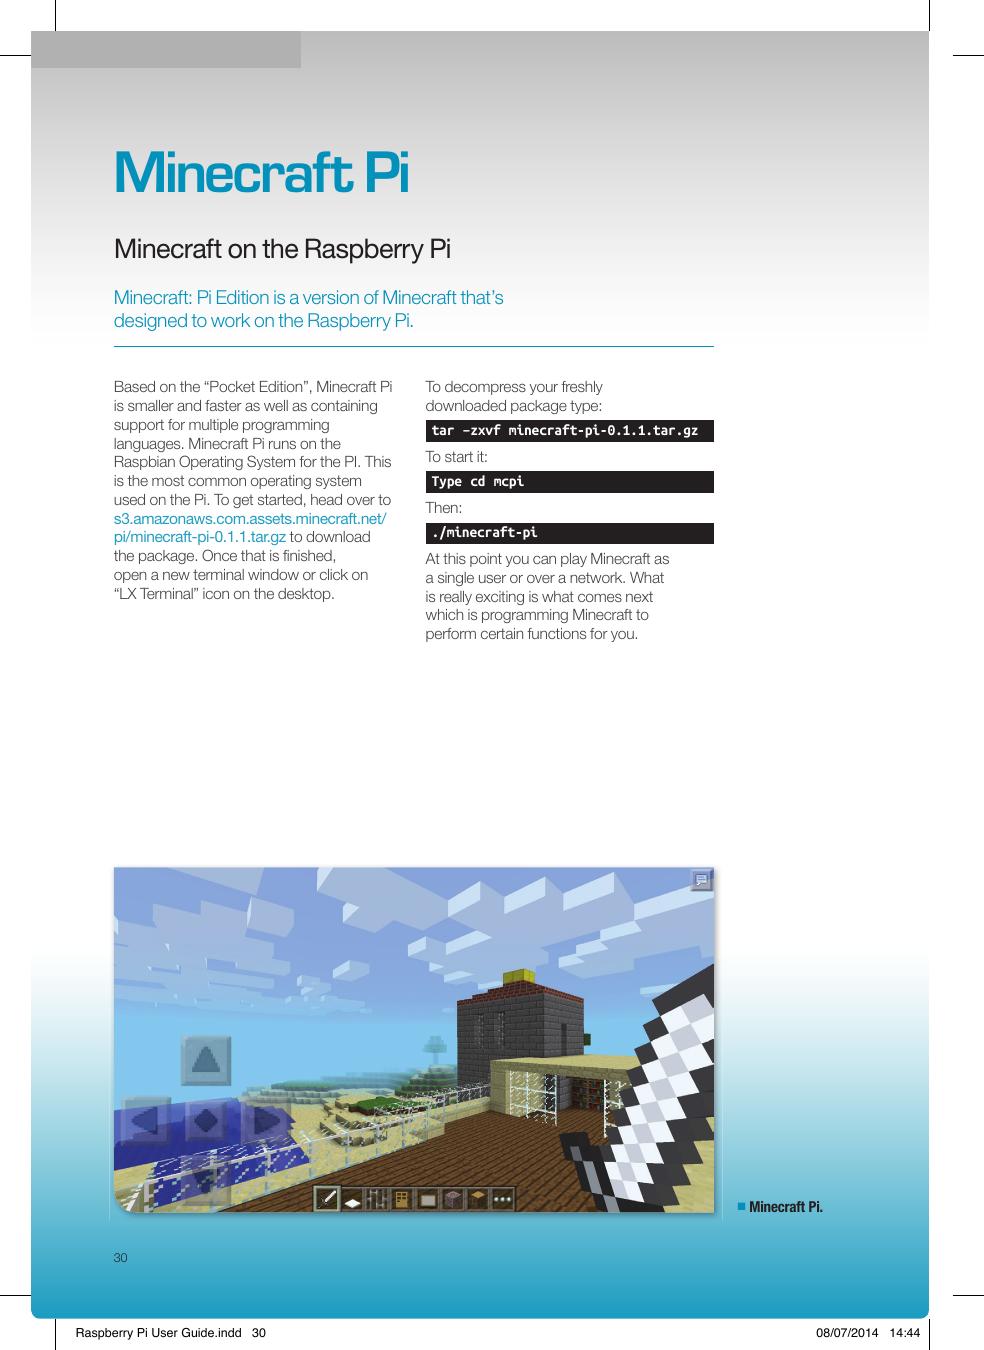 Raspberry Pi User Guide B+ Manual (English)